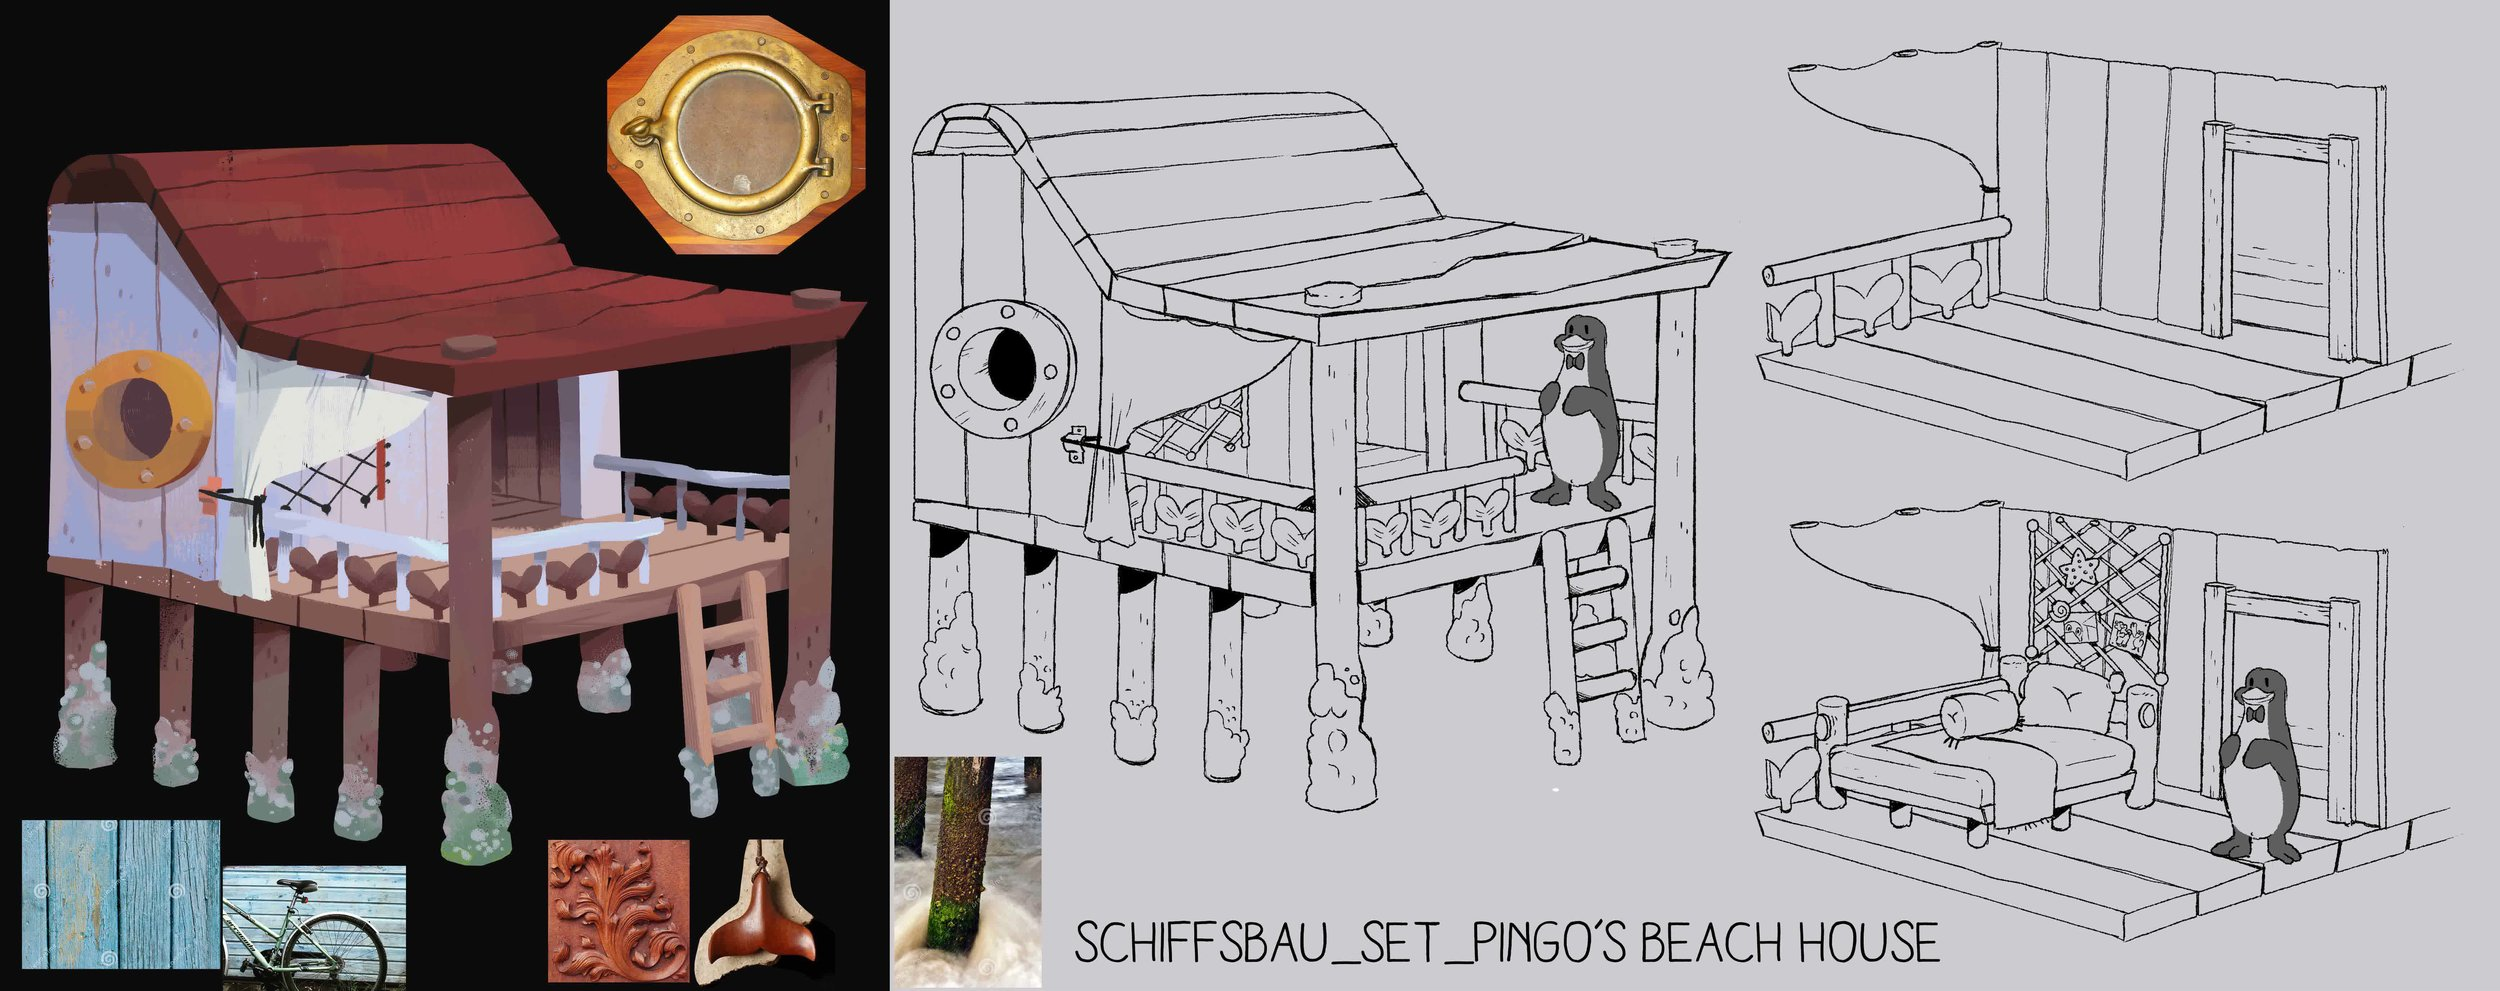 PROPS_PingoBeachHouse_DESIGN_PINGOBEACHHOUSEfinalisedDesign.v000_thumb.jpg